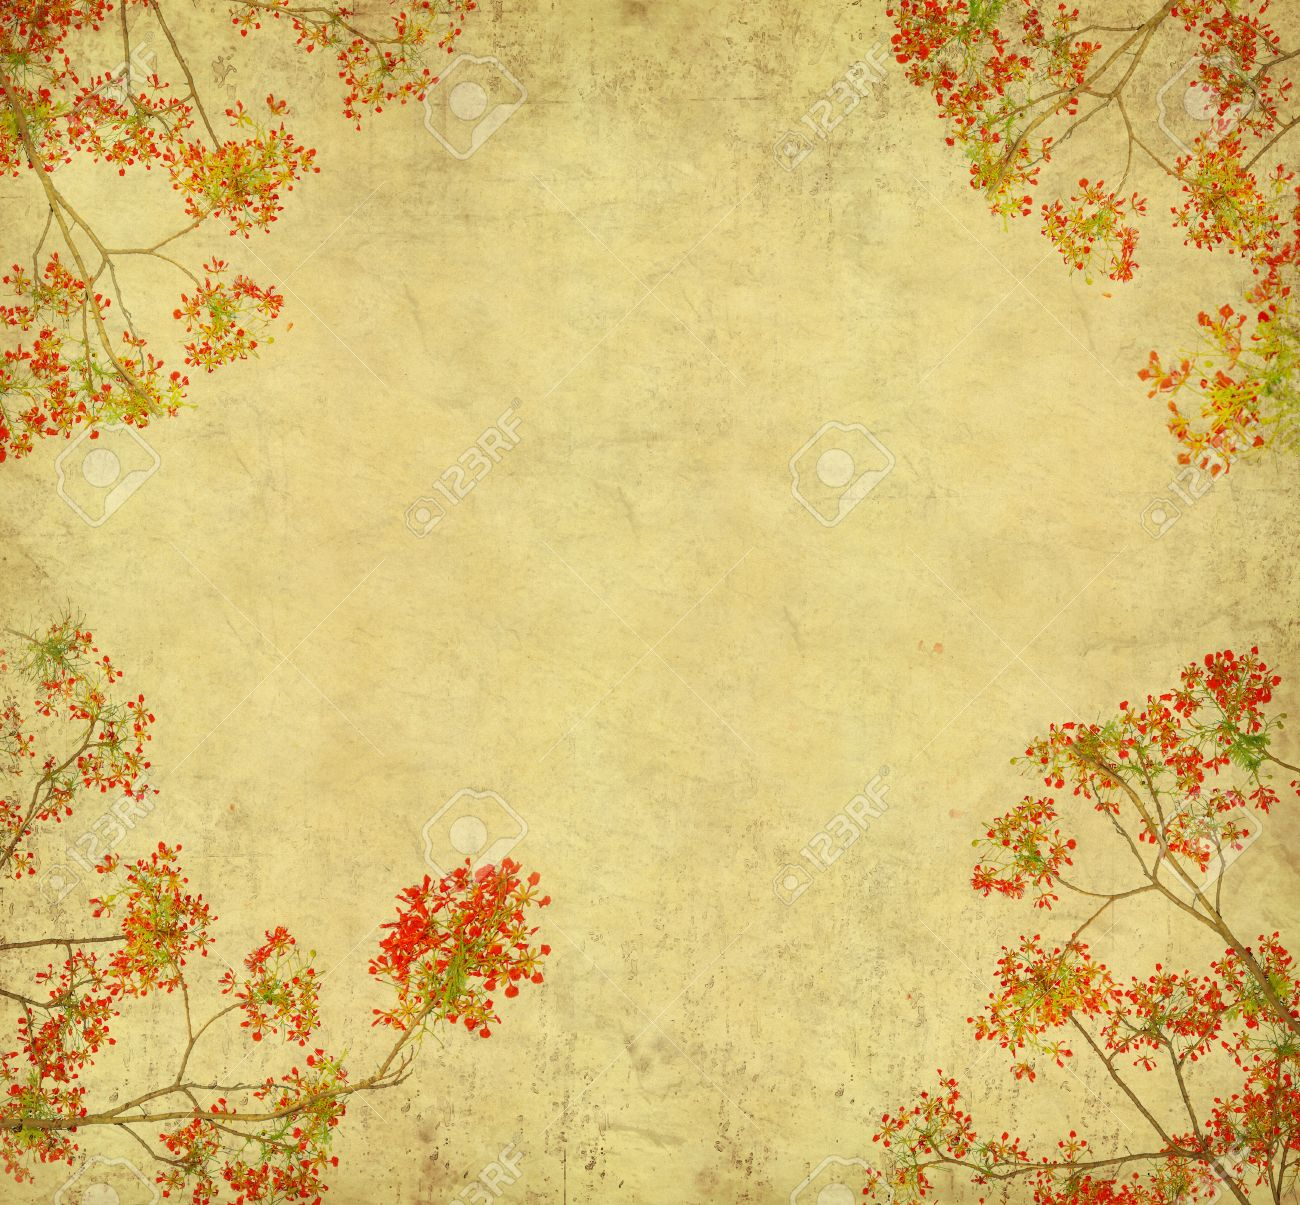 Vintage Flower Paper Kampa Luckincsolutions Org